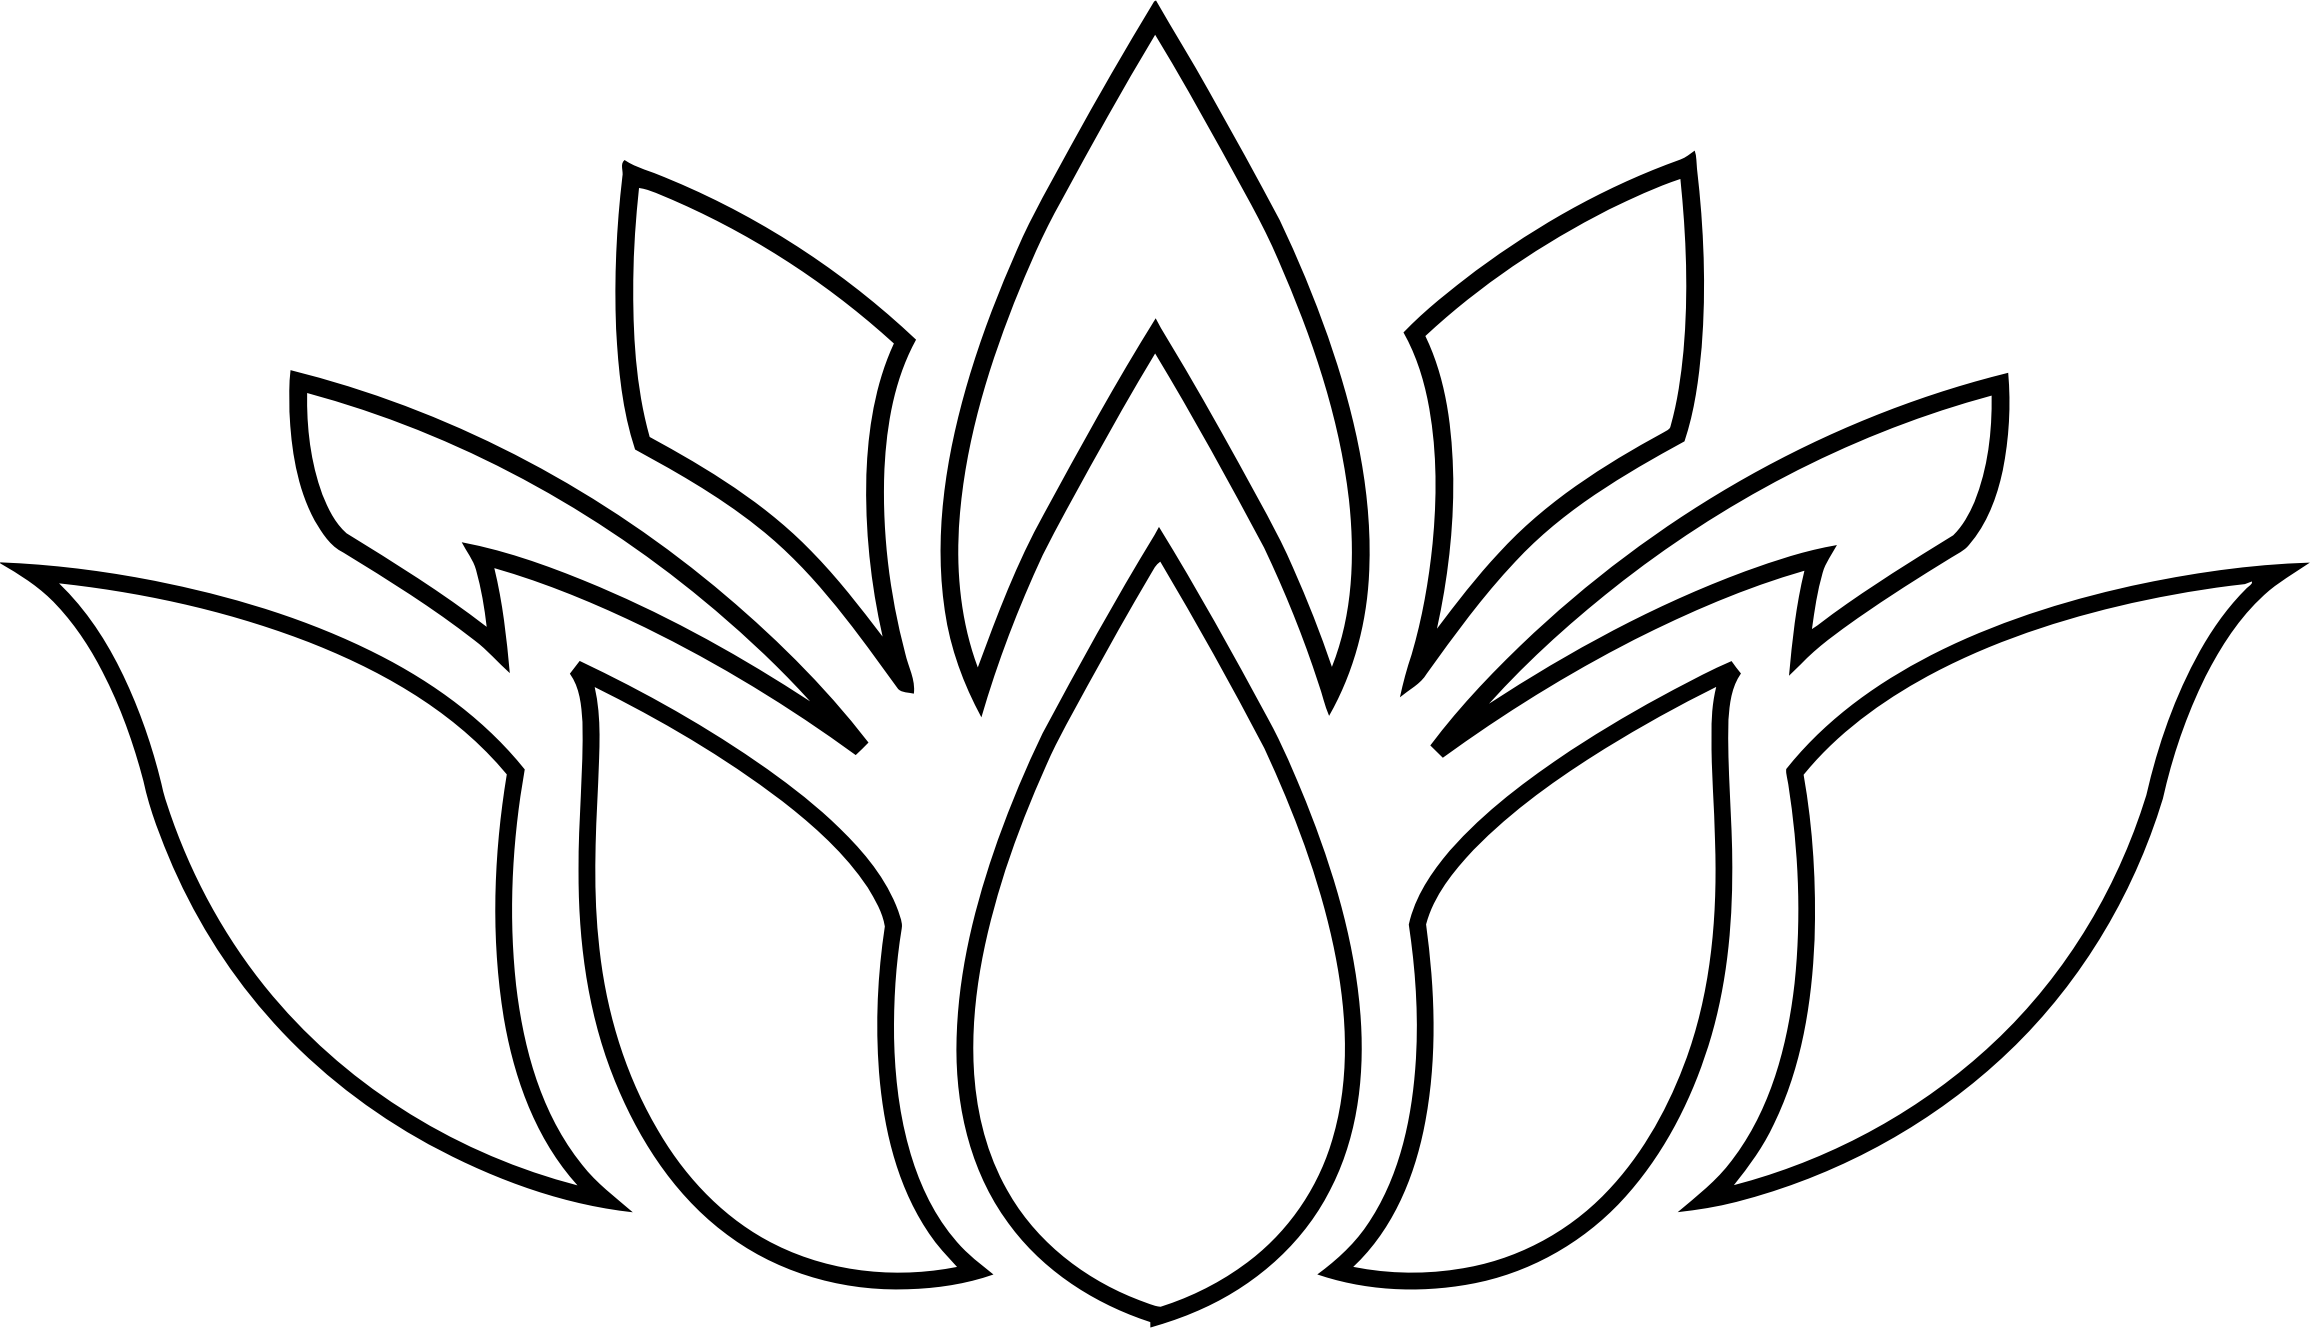 2310x1328 Clipart